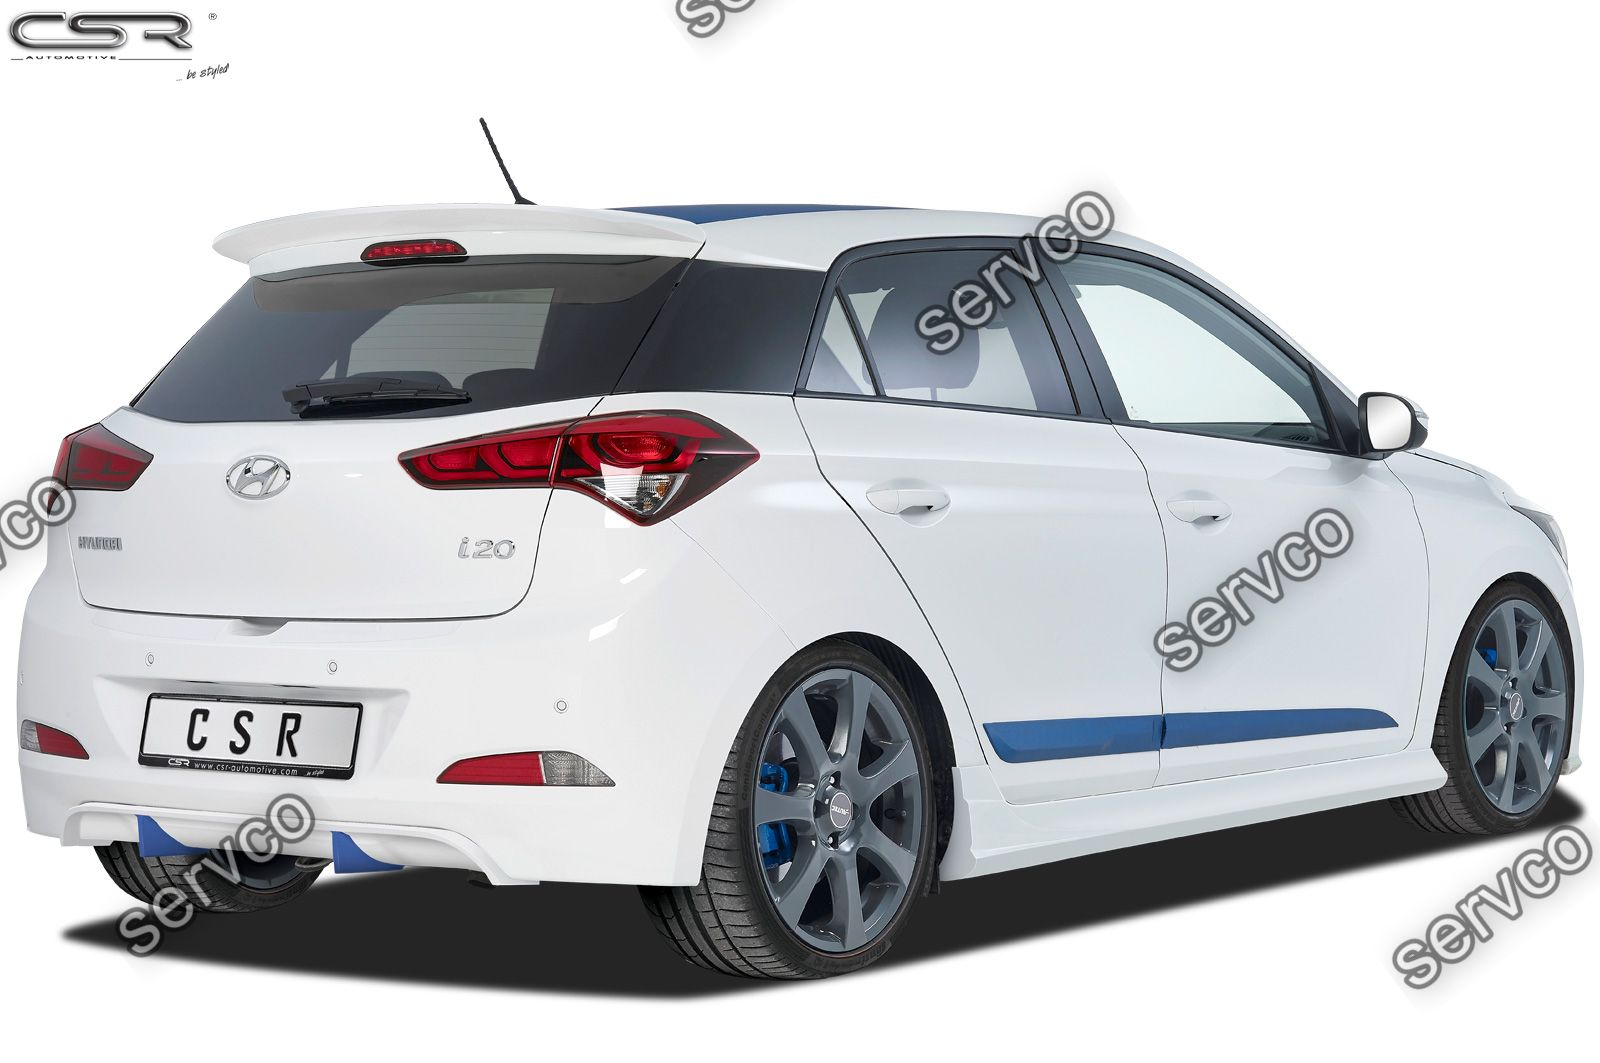 Prelungire difuzor tuning sport bara spate Hyundai I20 GB CSR HA209 2014-2018 v1